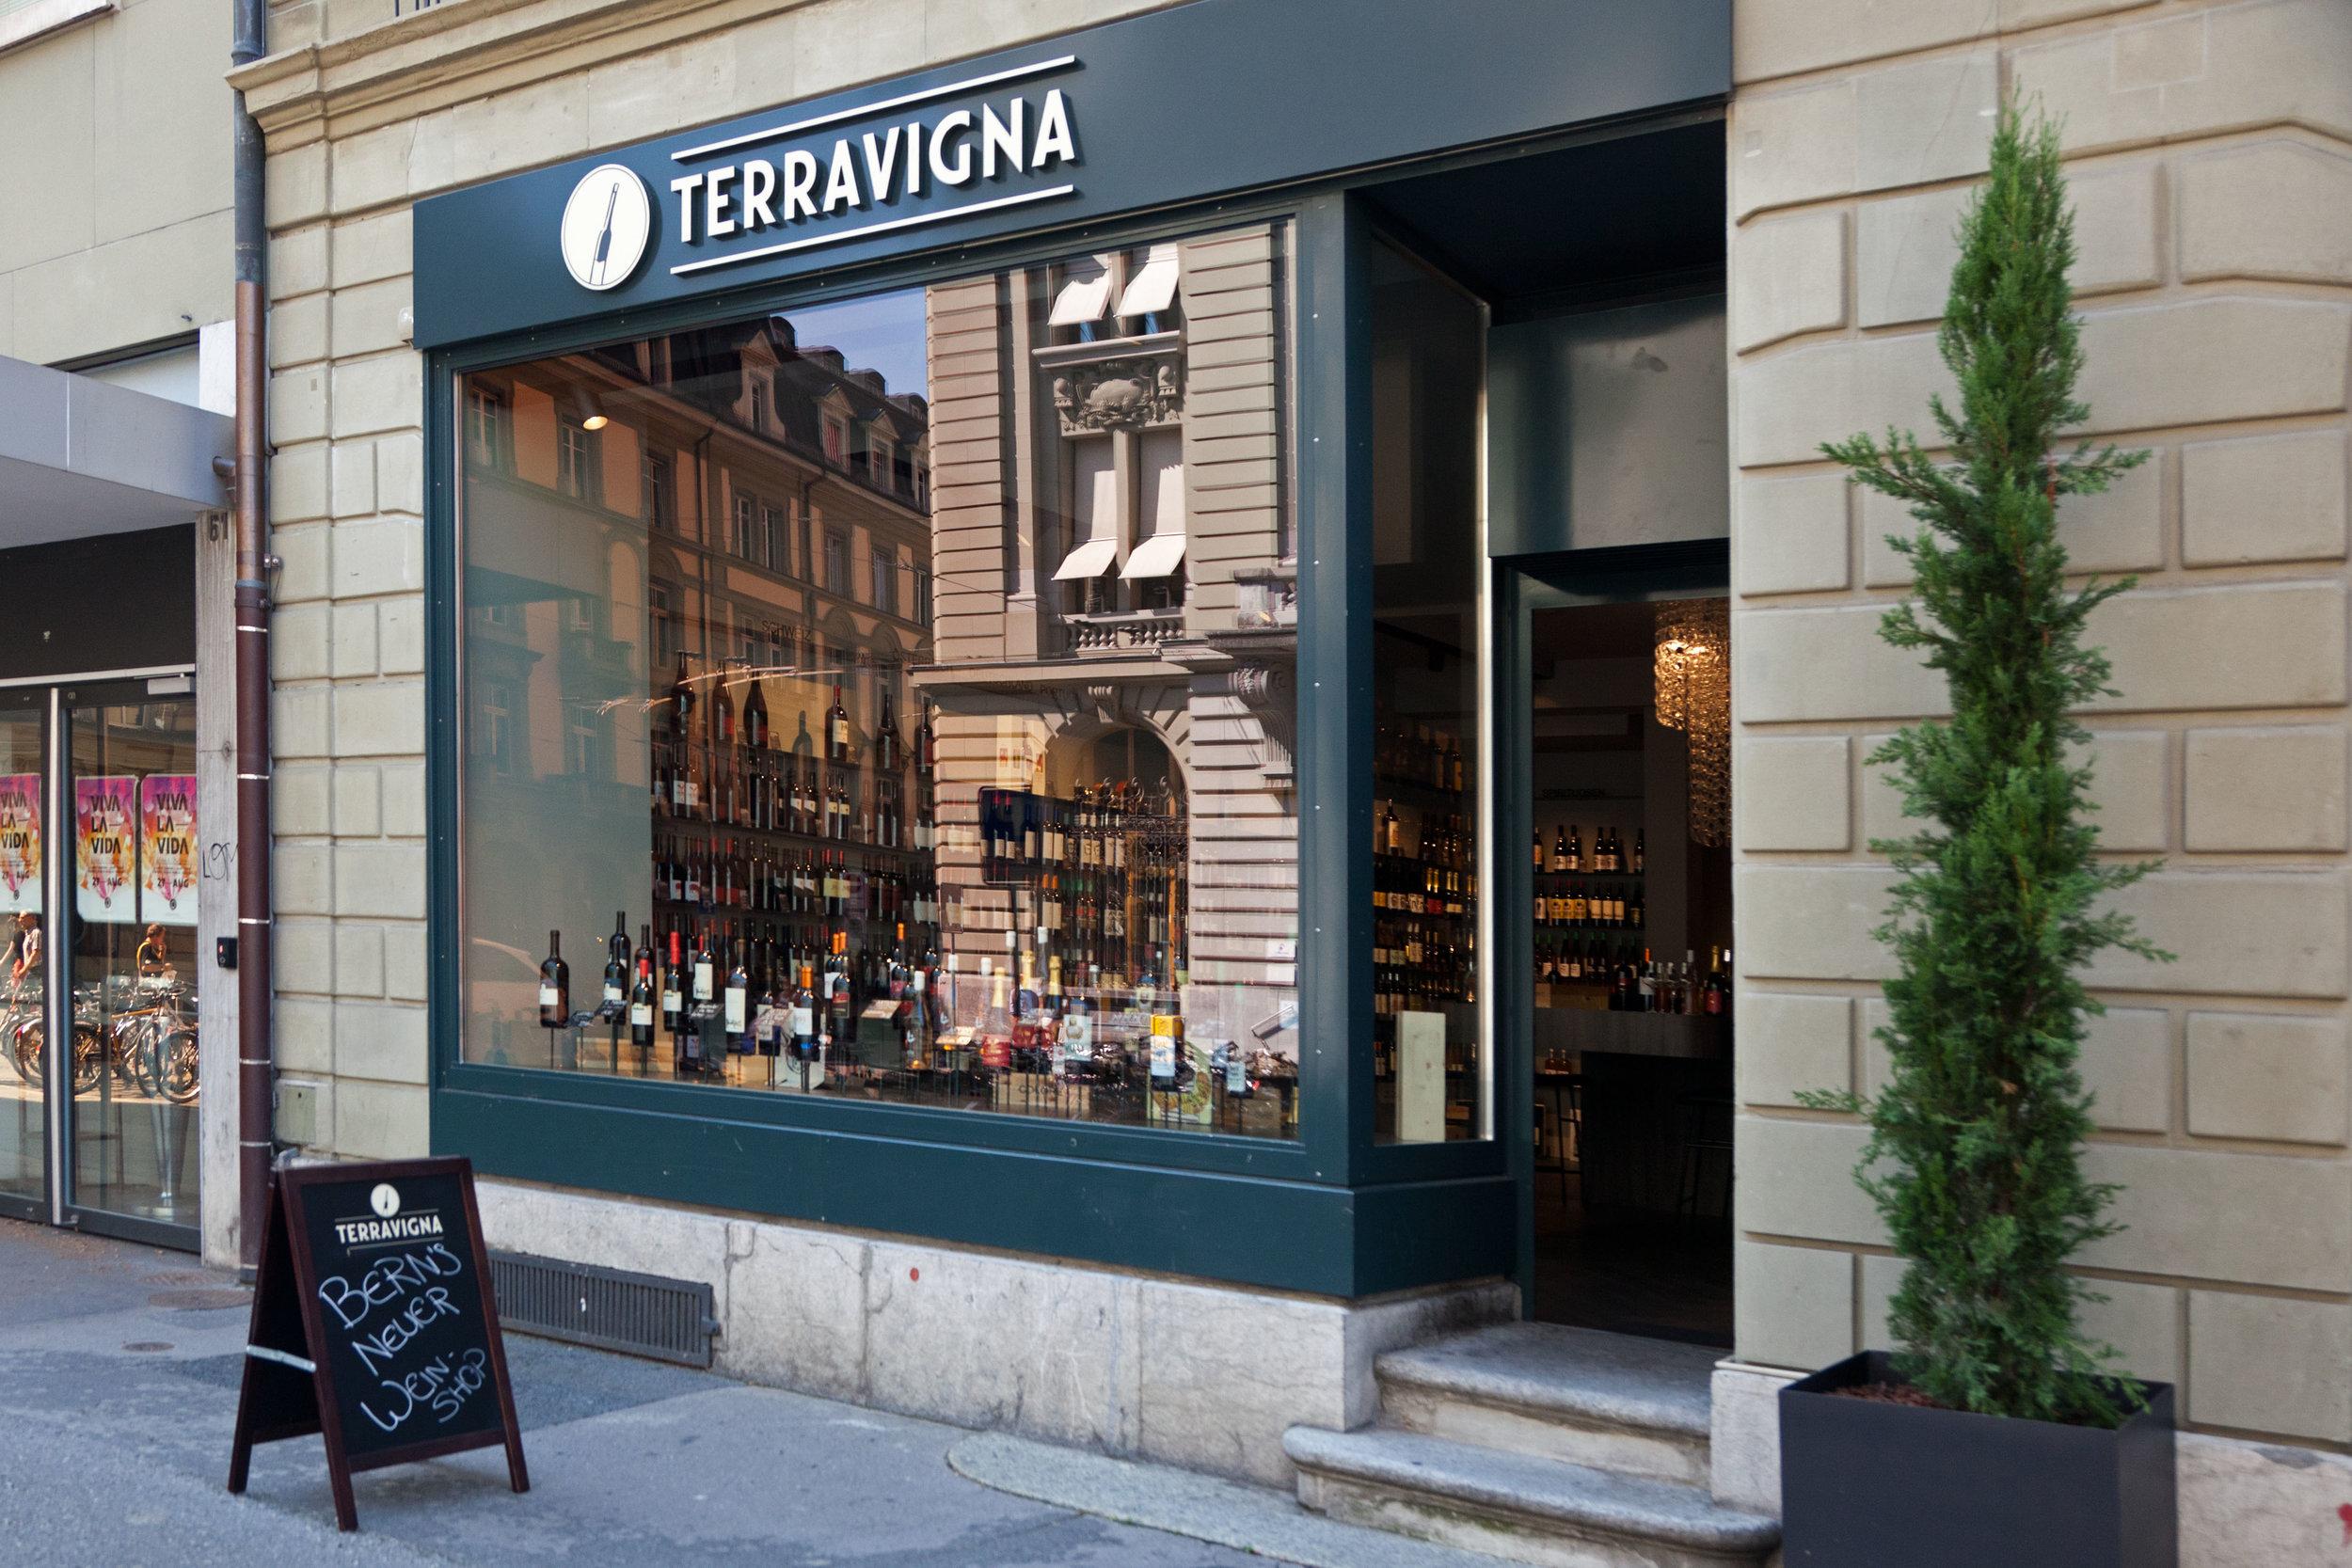 terravigna_0772.jpg